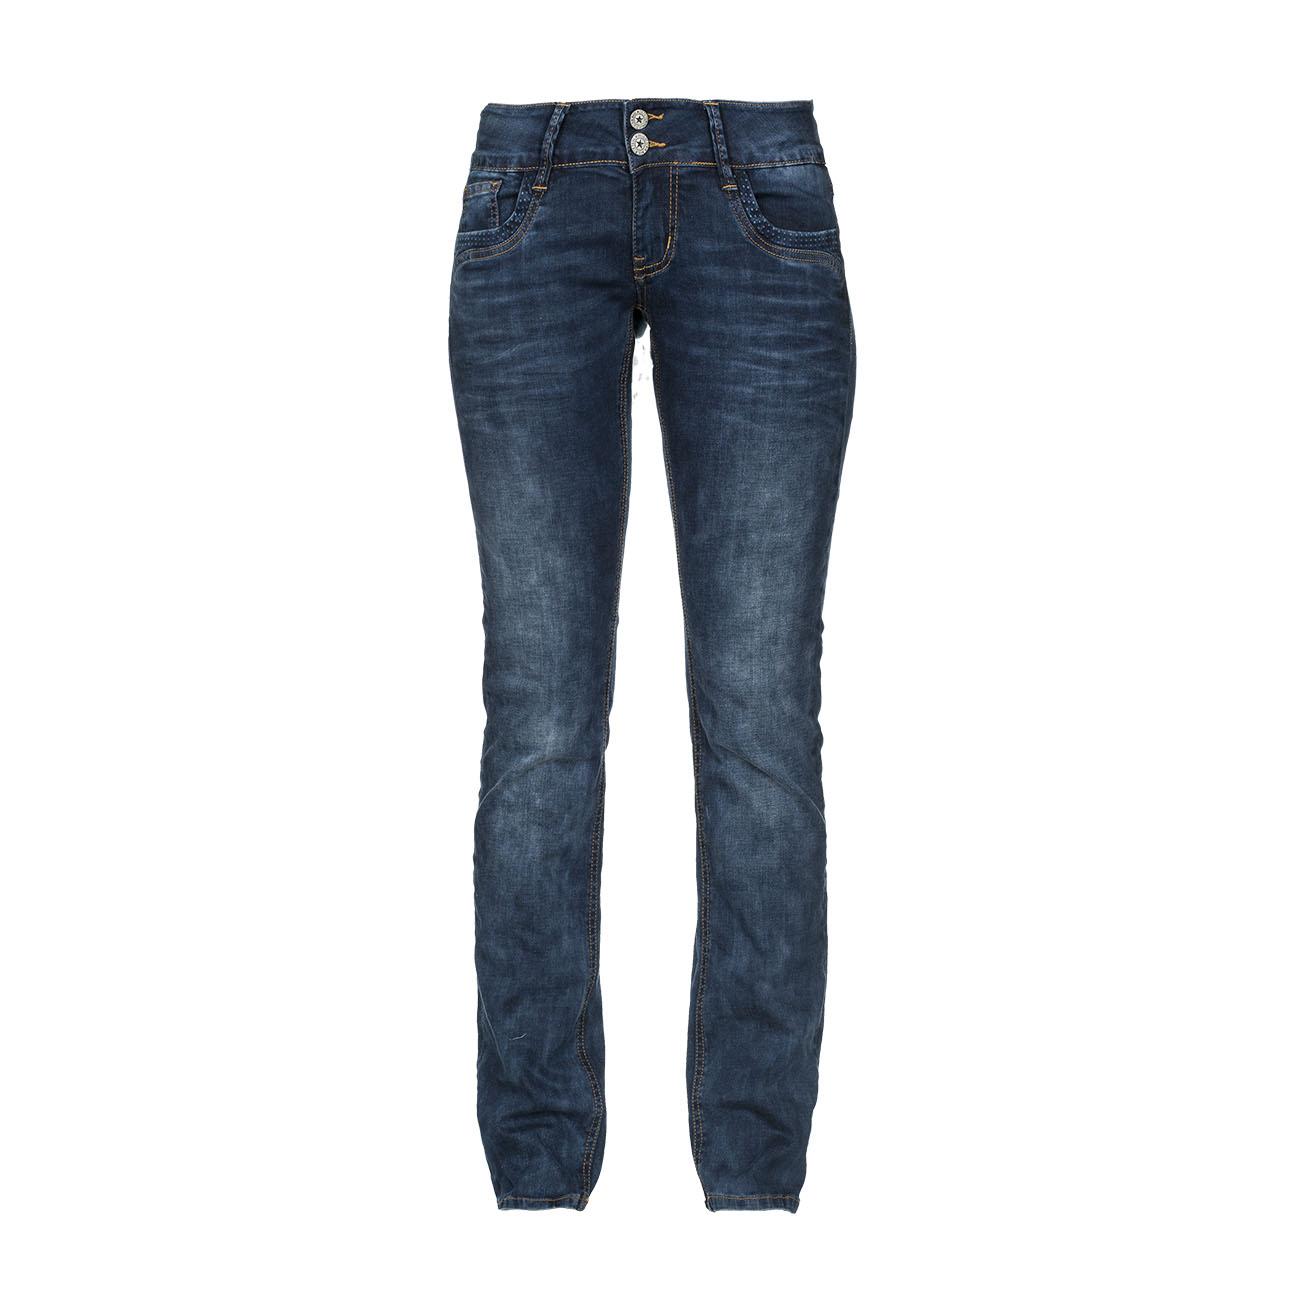 m o d damen jeans larissa straight leg blau brake blue kaufen jeans direct de. Black Bedroom Furniture Sets. Home Design Ideas